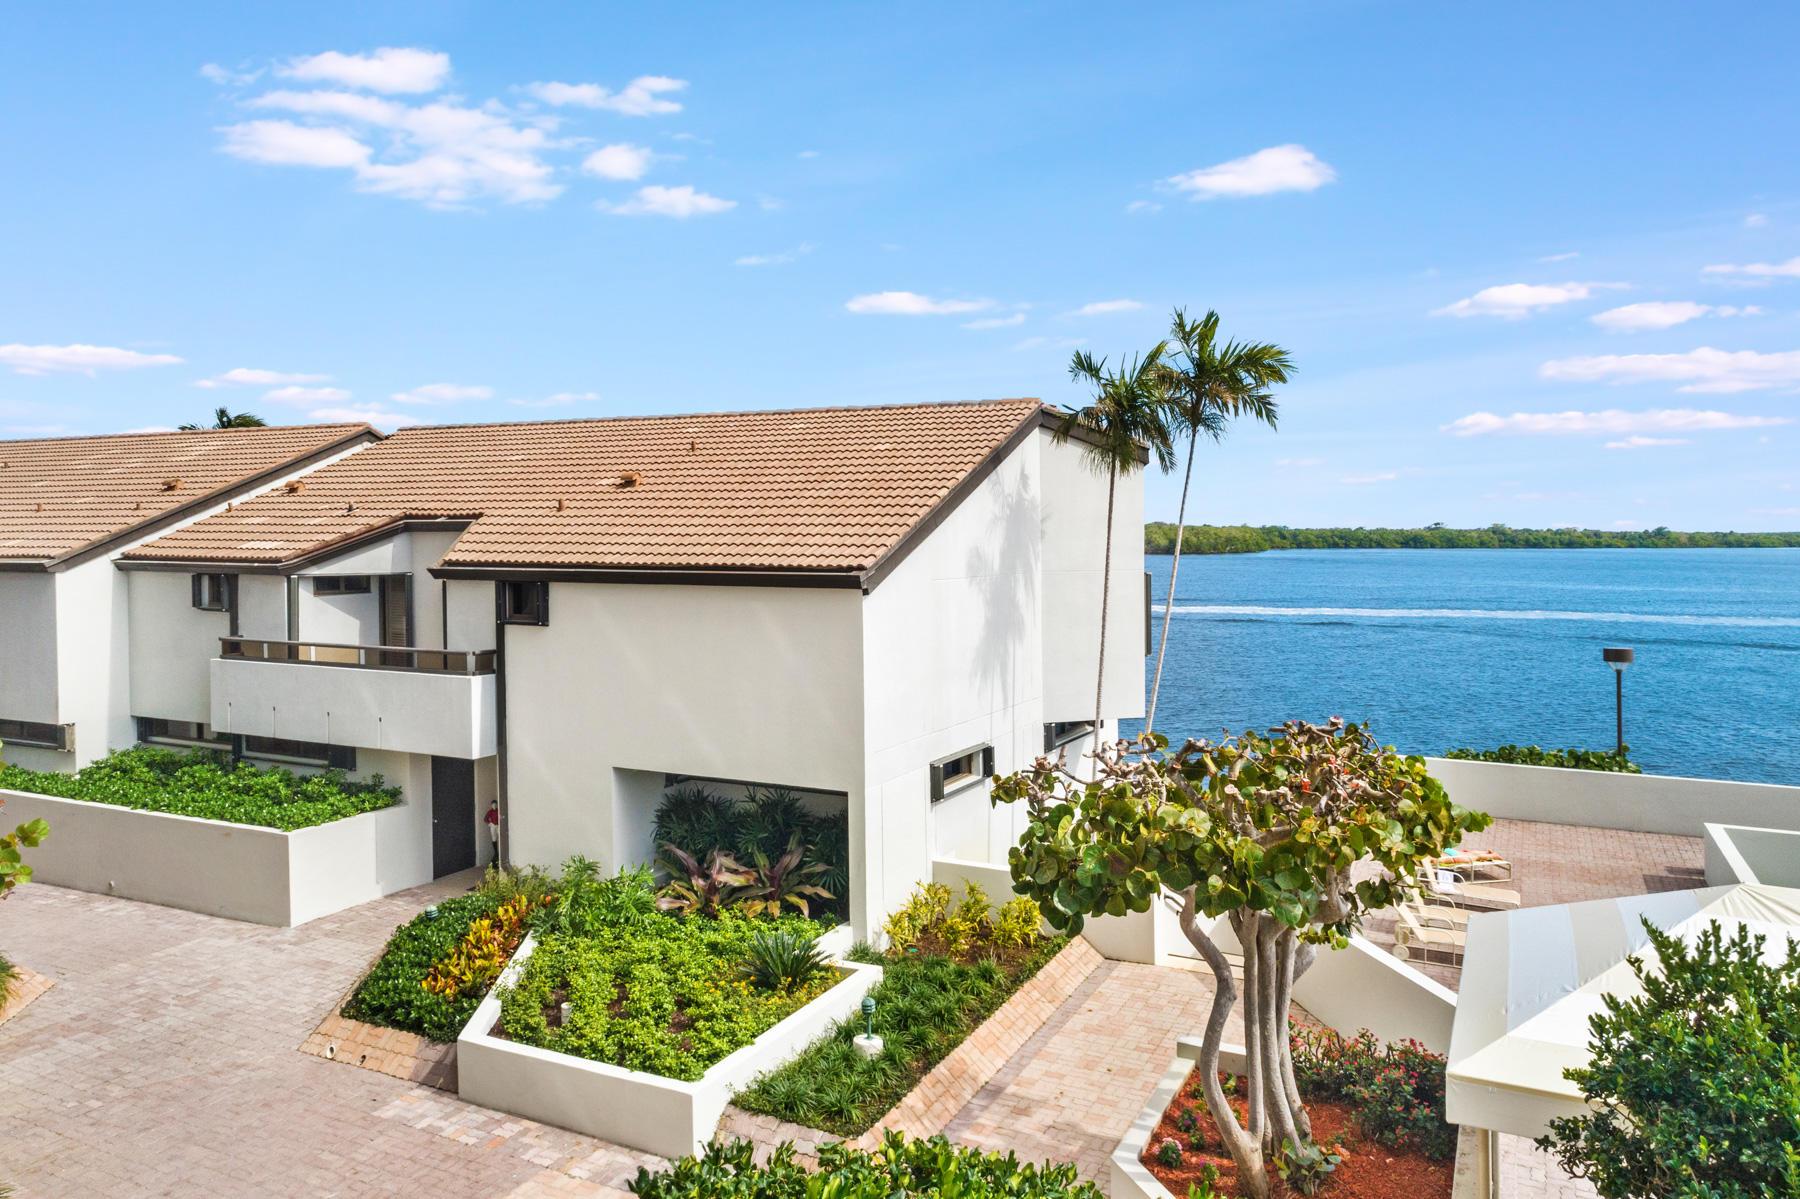 100 Lakeshore Drive L9, North Palm Beach, Florida 33408, 3 Bedrooms Bedrooms, ,3.1 BathroomsBathrooms,A,Condominium,Lakeshore,RX-10503814